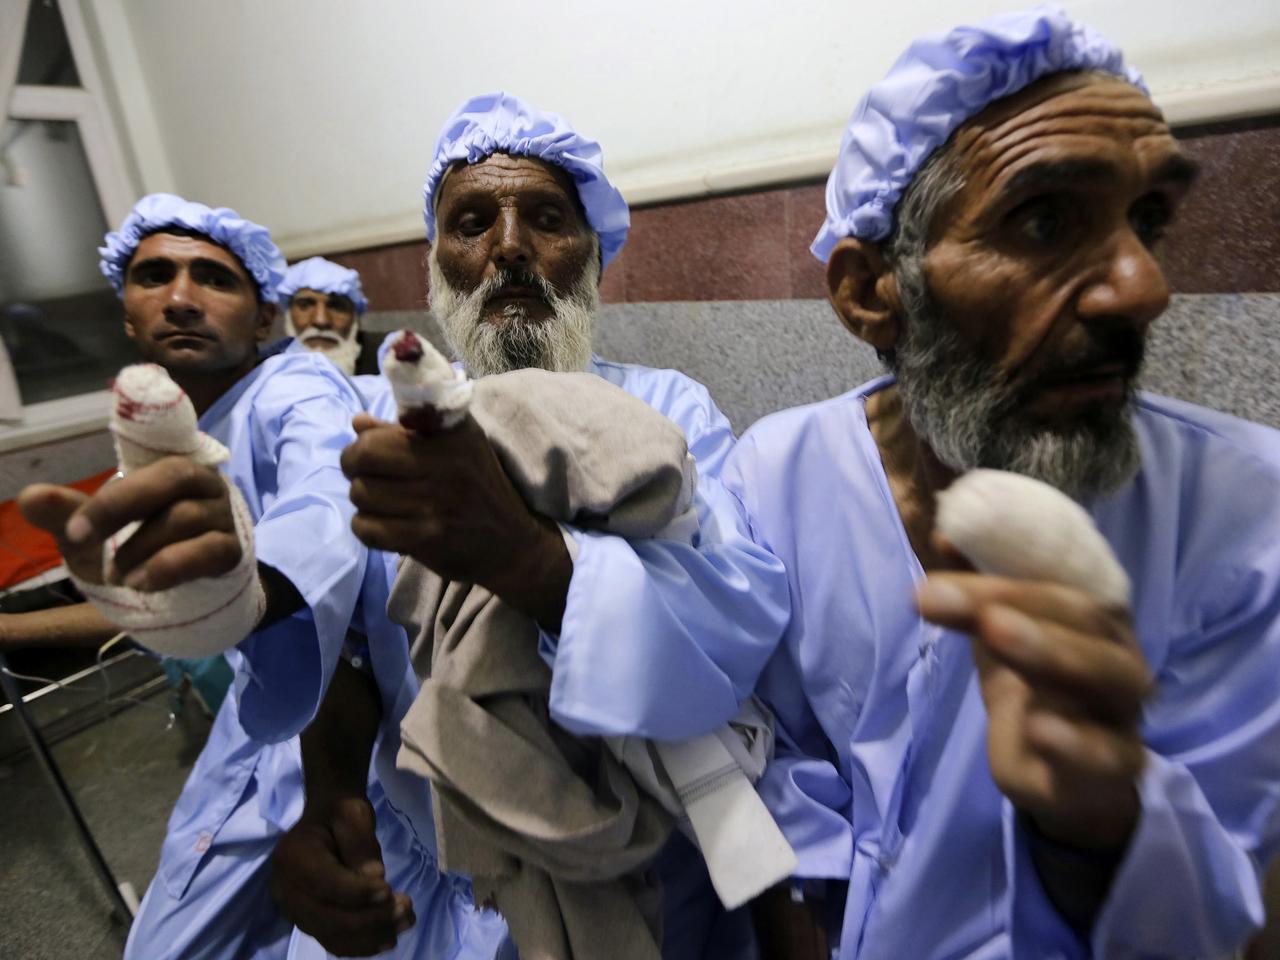 Afghanistan election sees millions vote despite Taliban